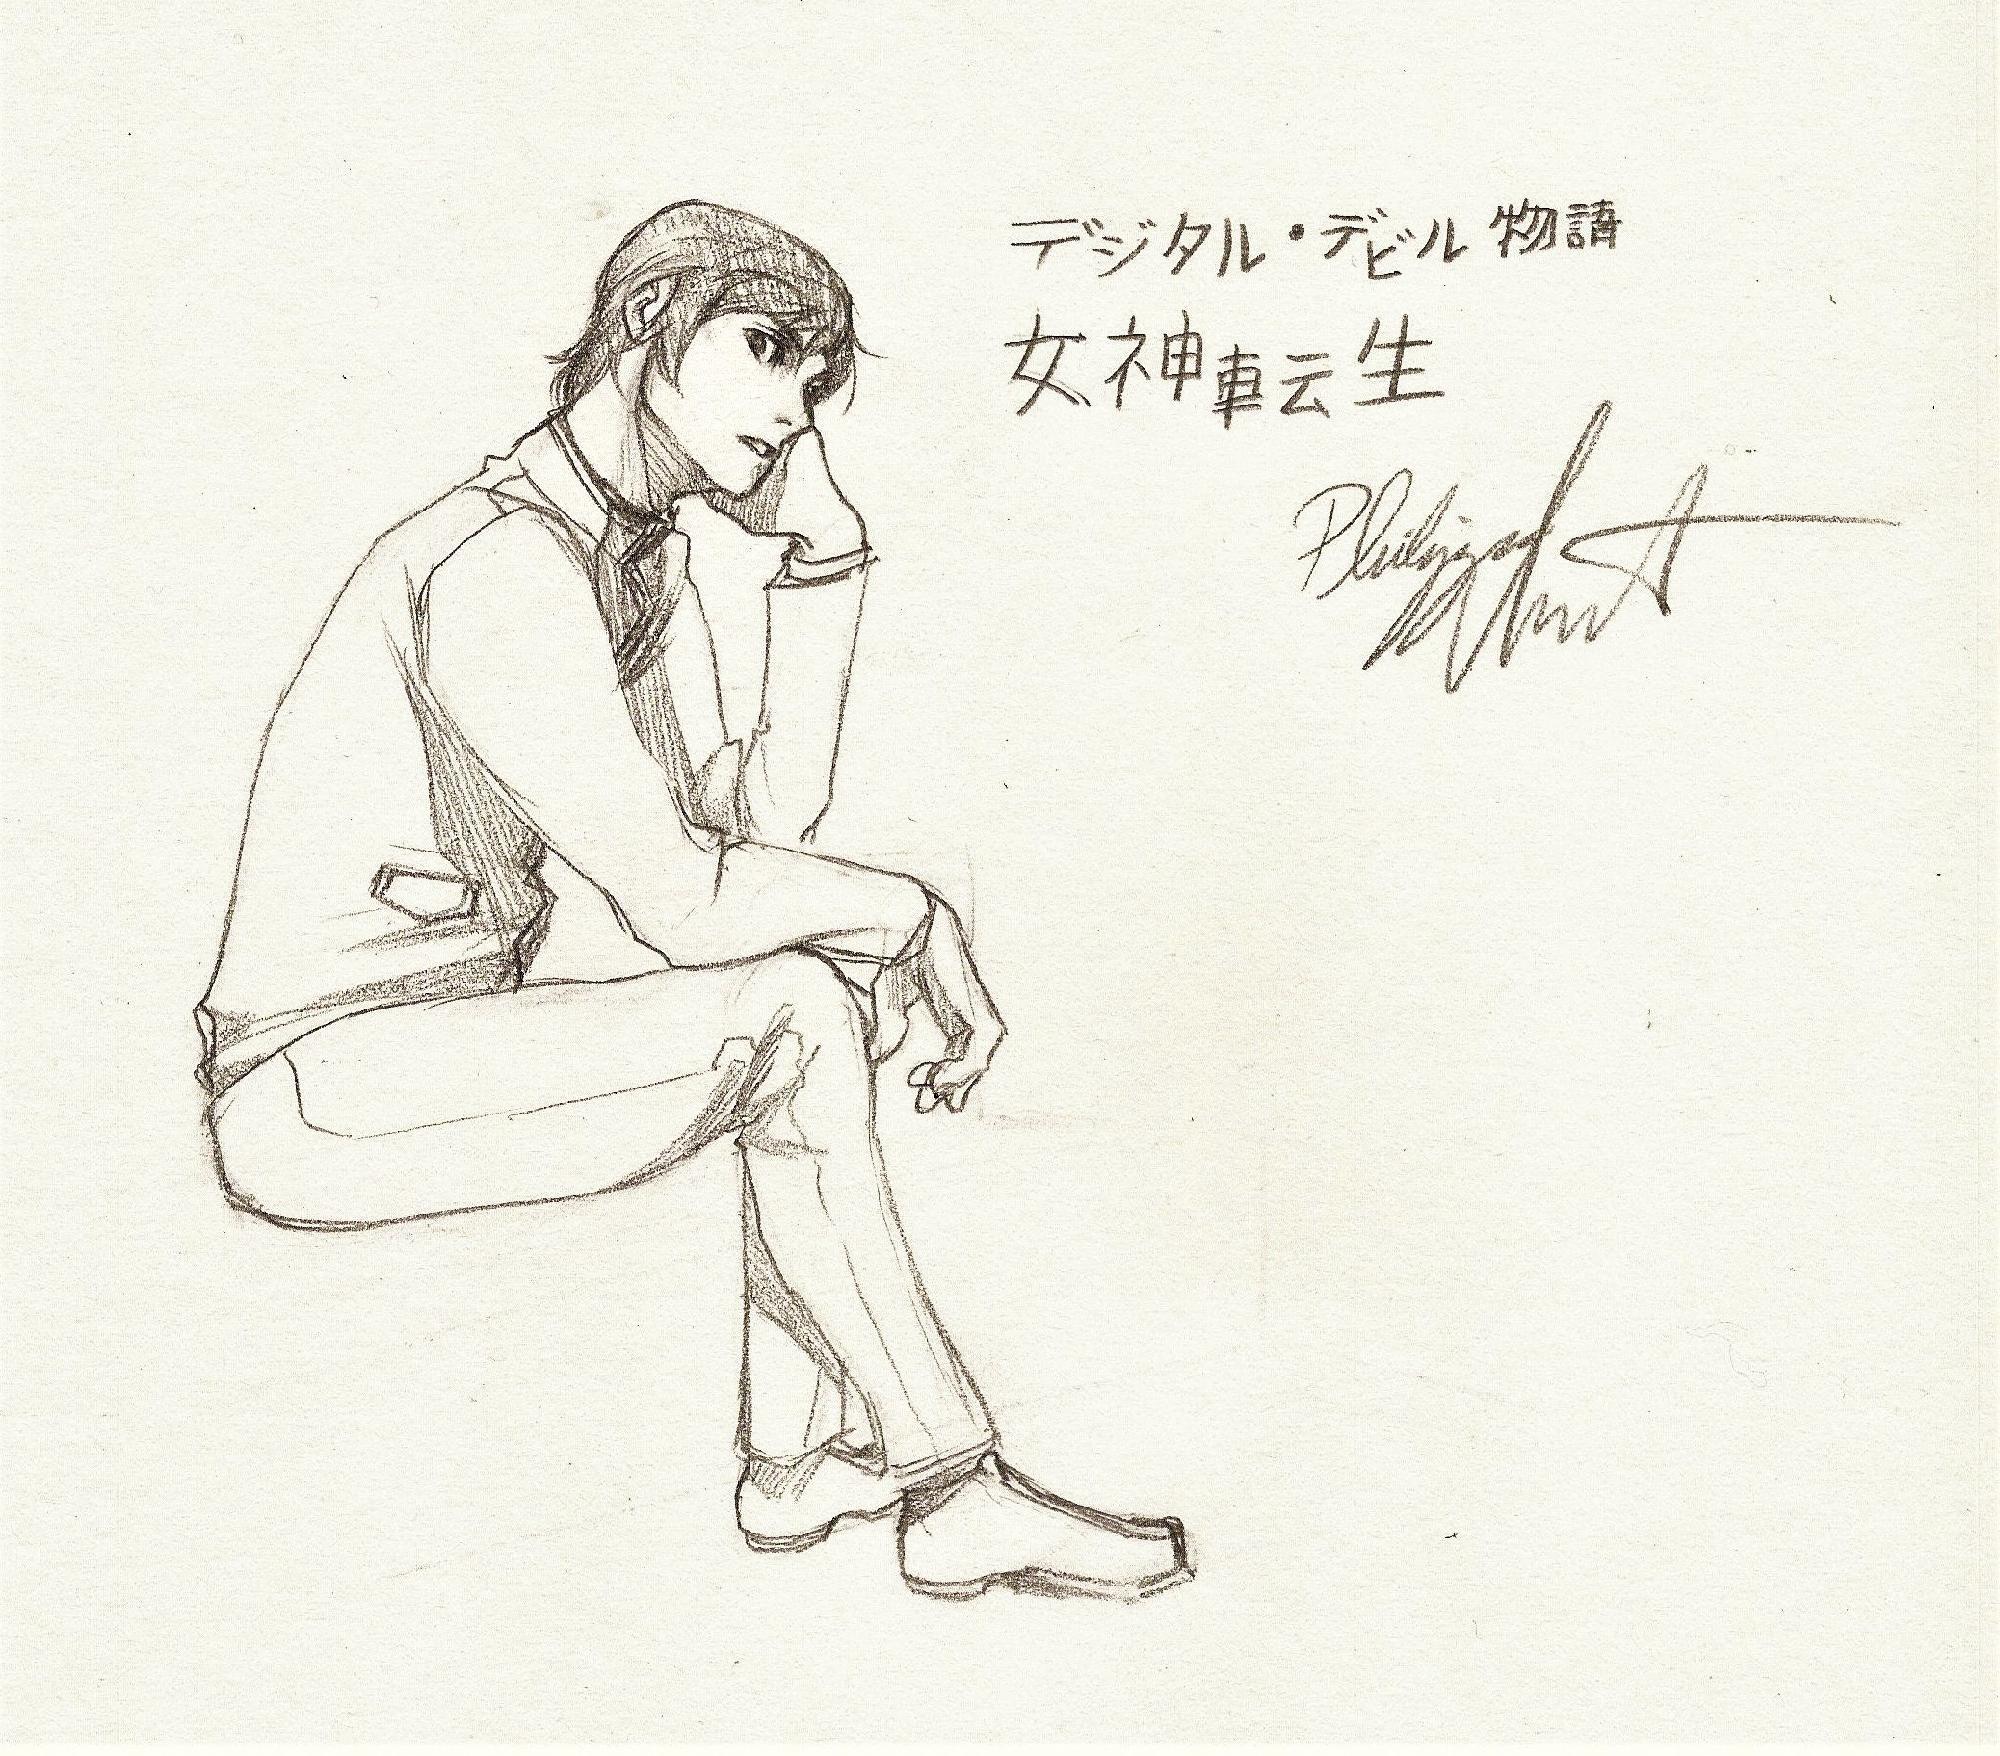 smelly boi, smt series founder nakajima sketch